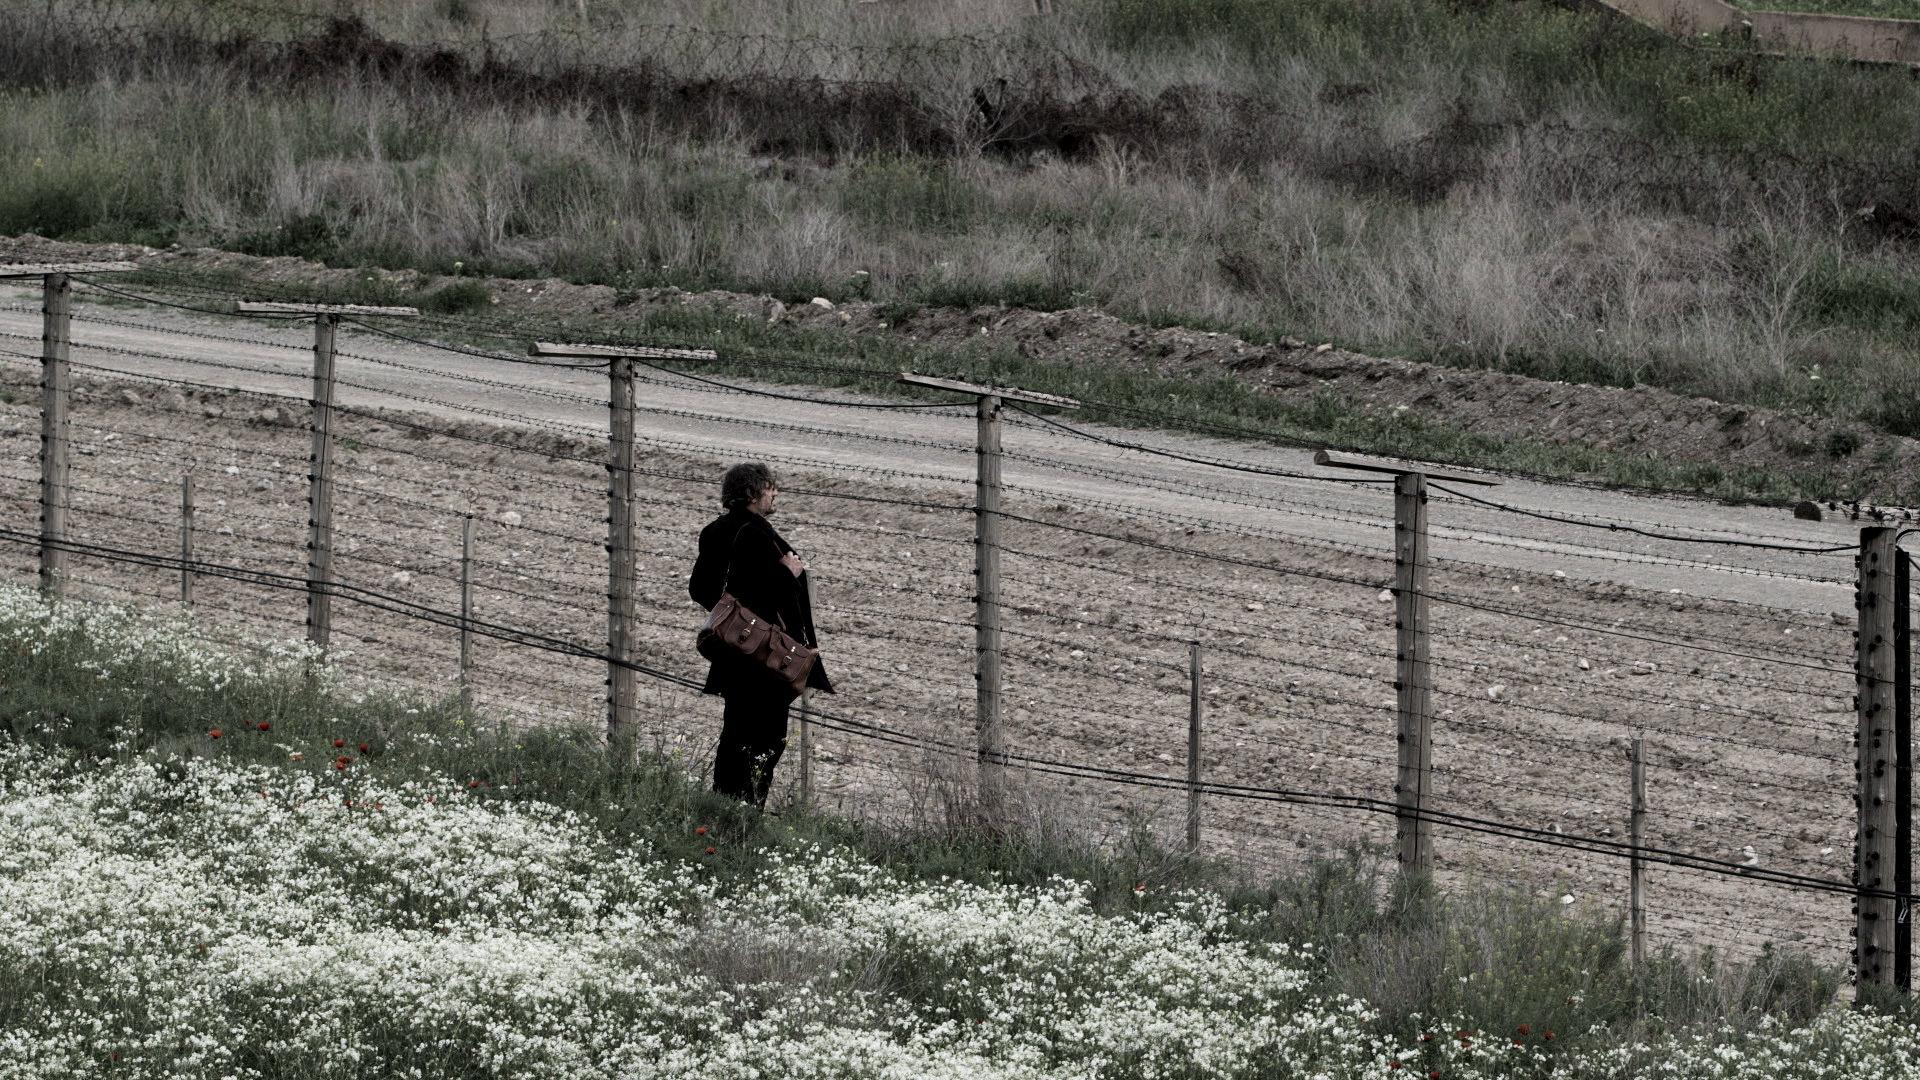 armenia m a litter